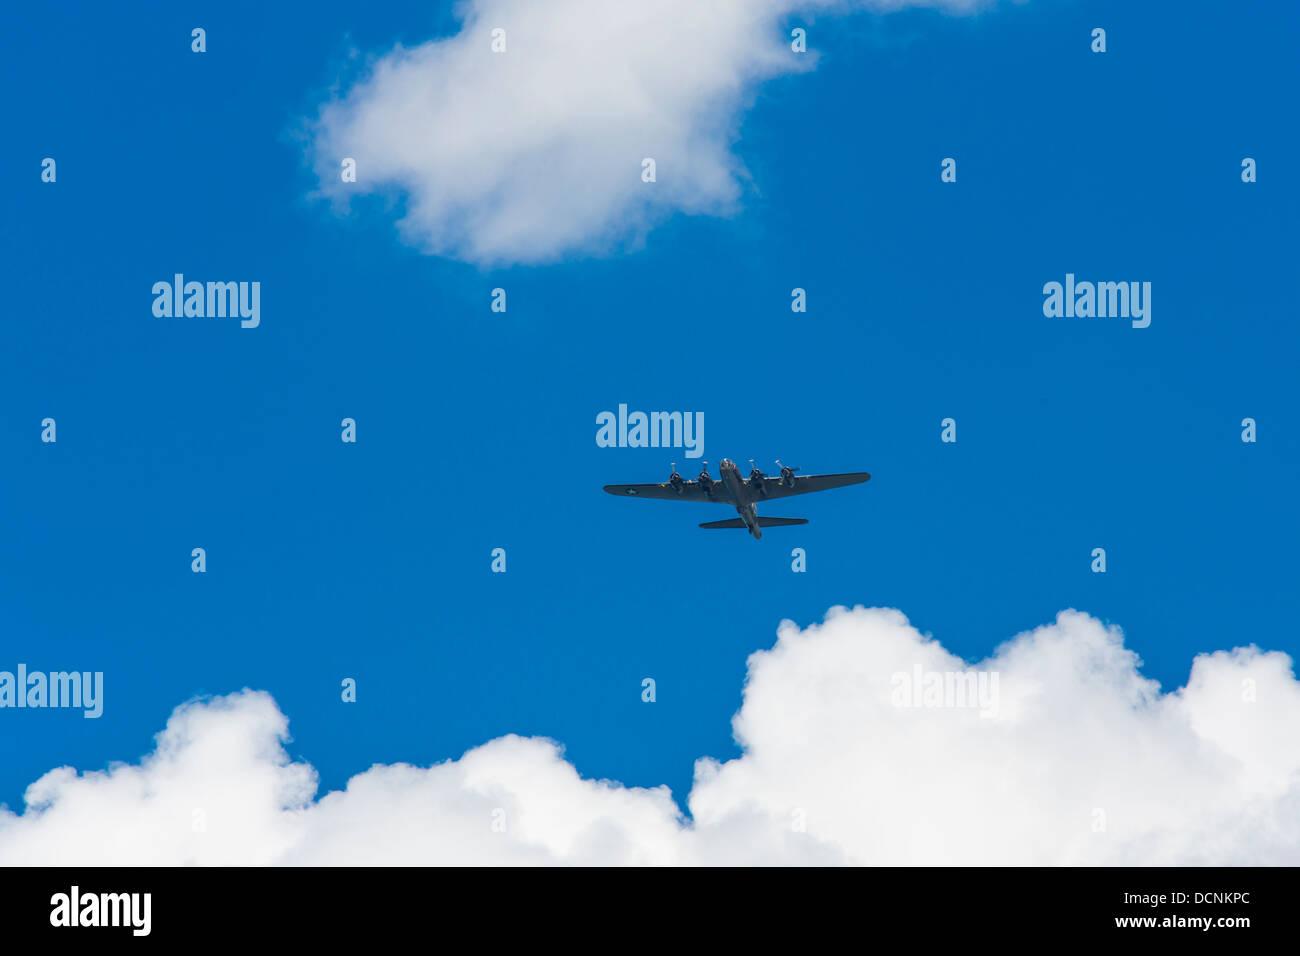 Boeing B-17 Flying Fortress World War II bomber flying over Buffalo New York United States Stock Photo